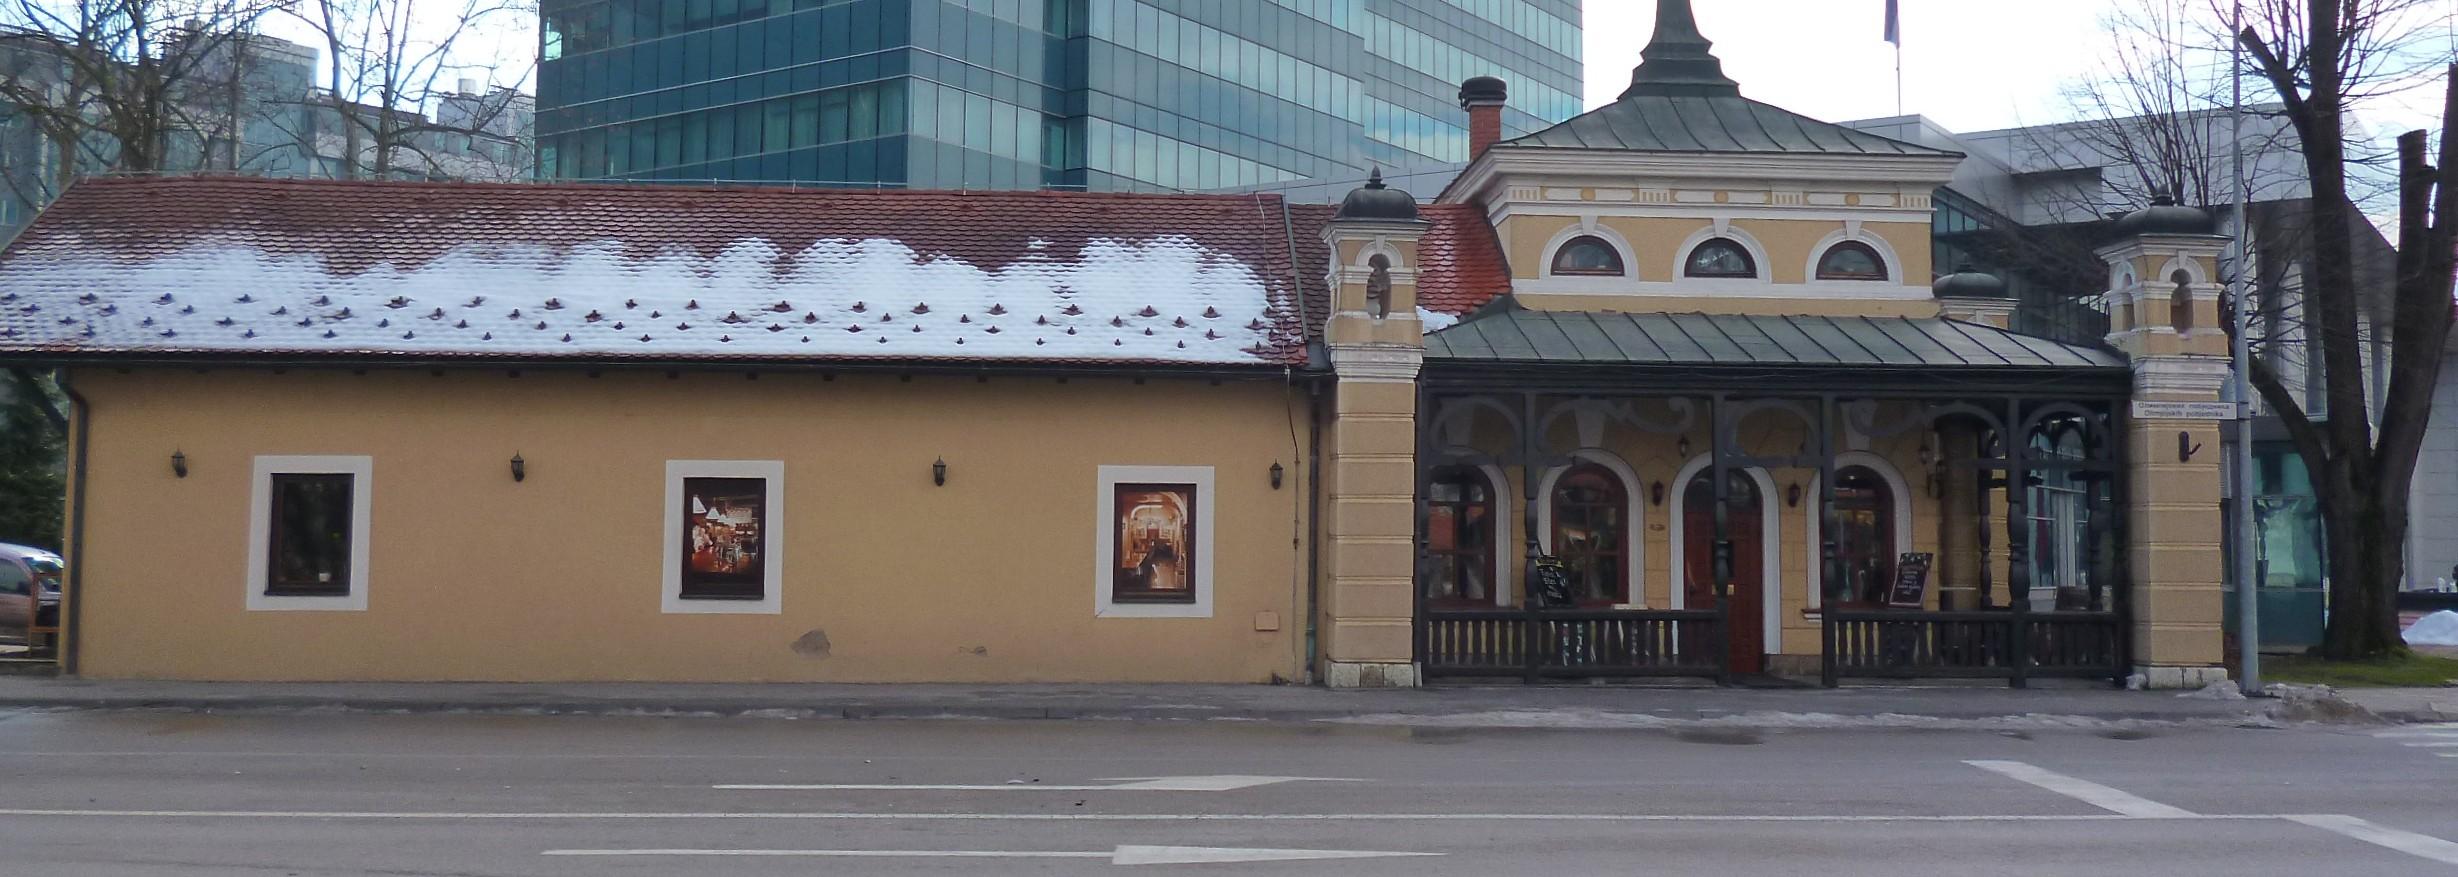 Малая железнодорожная станция. Фото: Елена Арсениевич, CC BY-SA 3.0